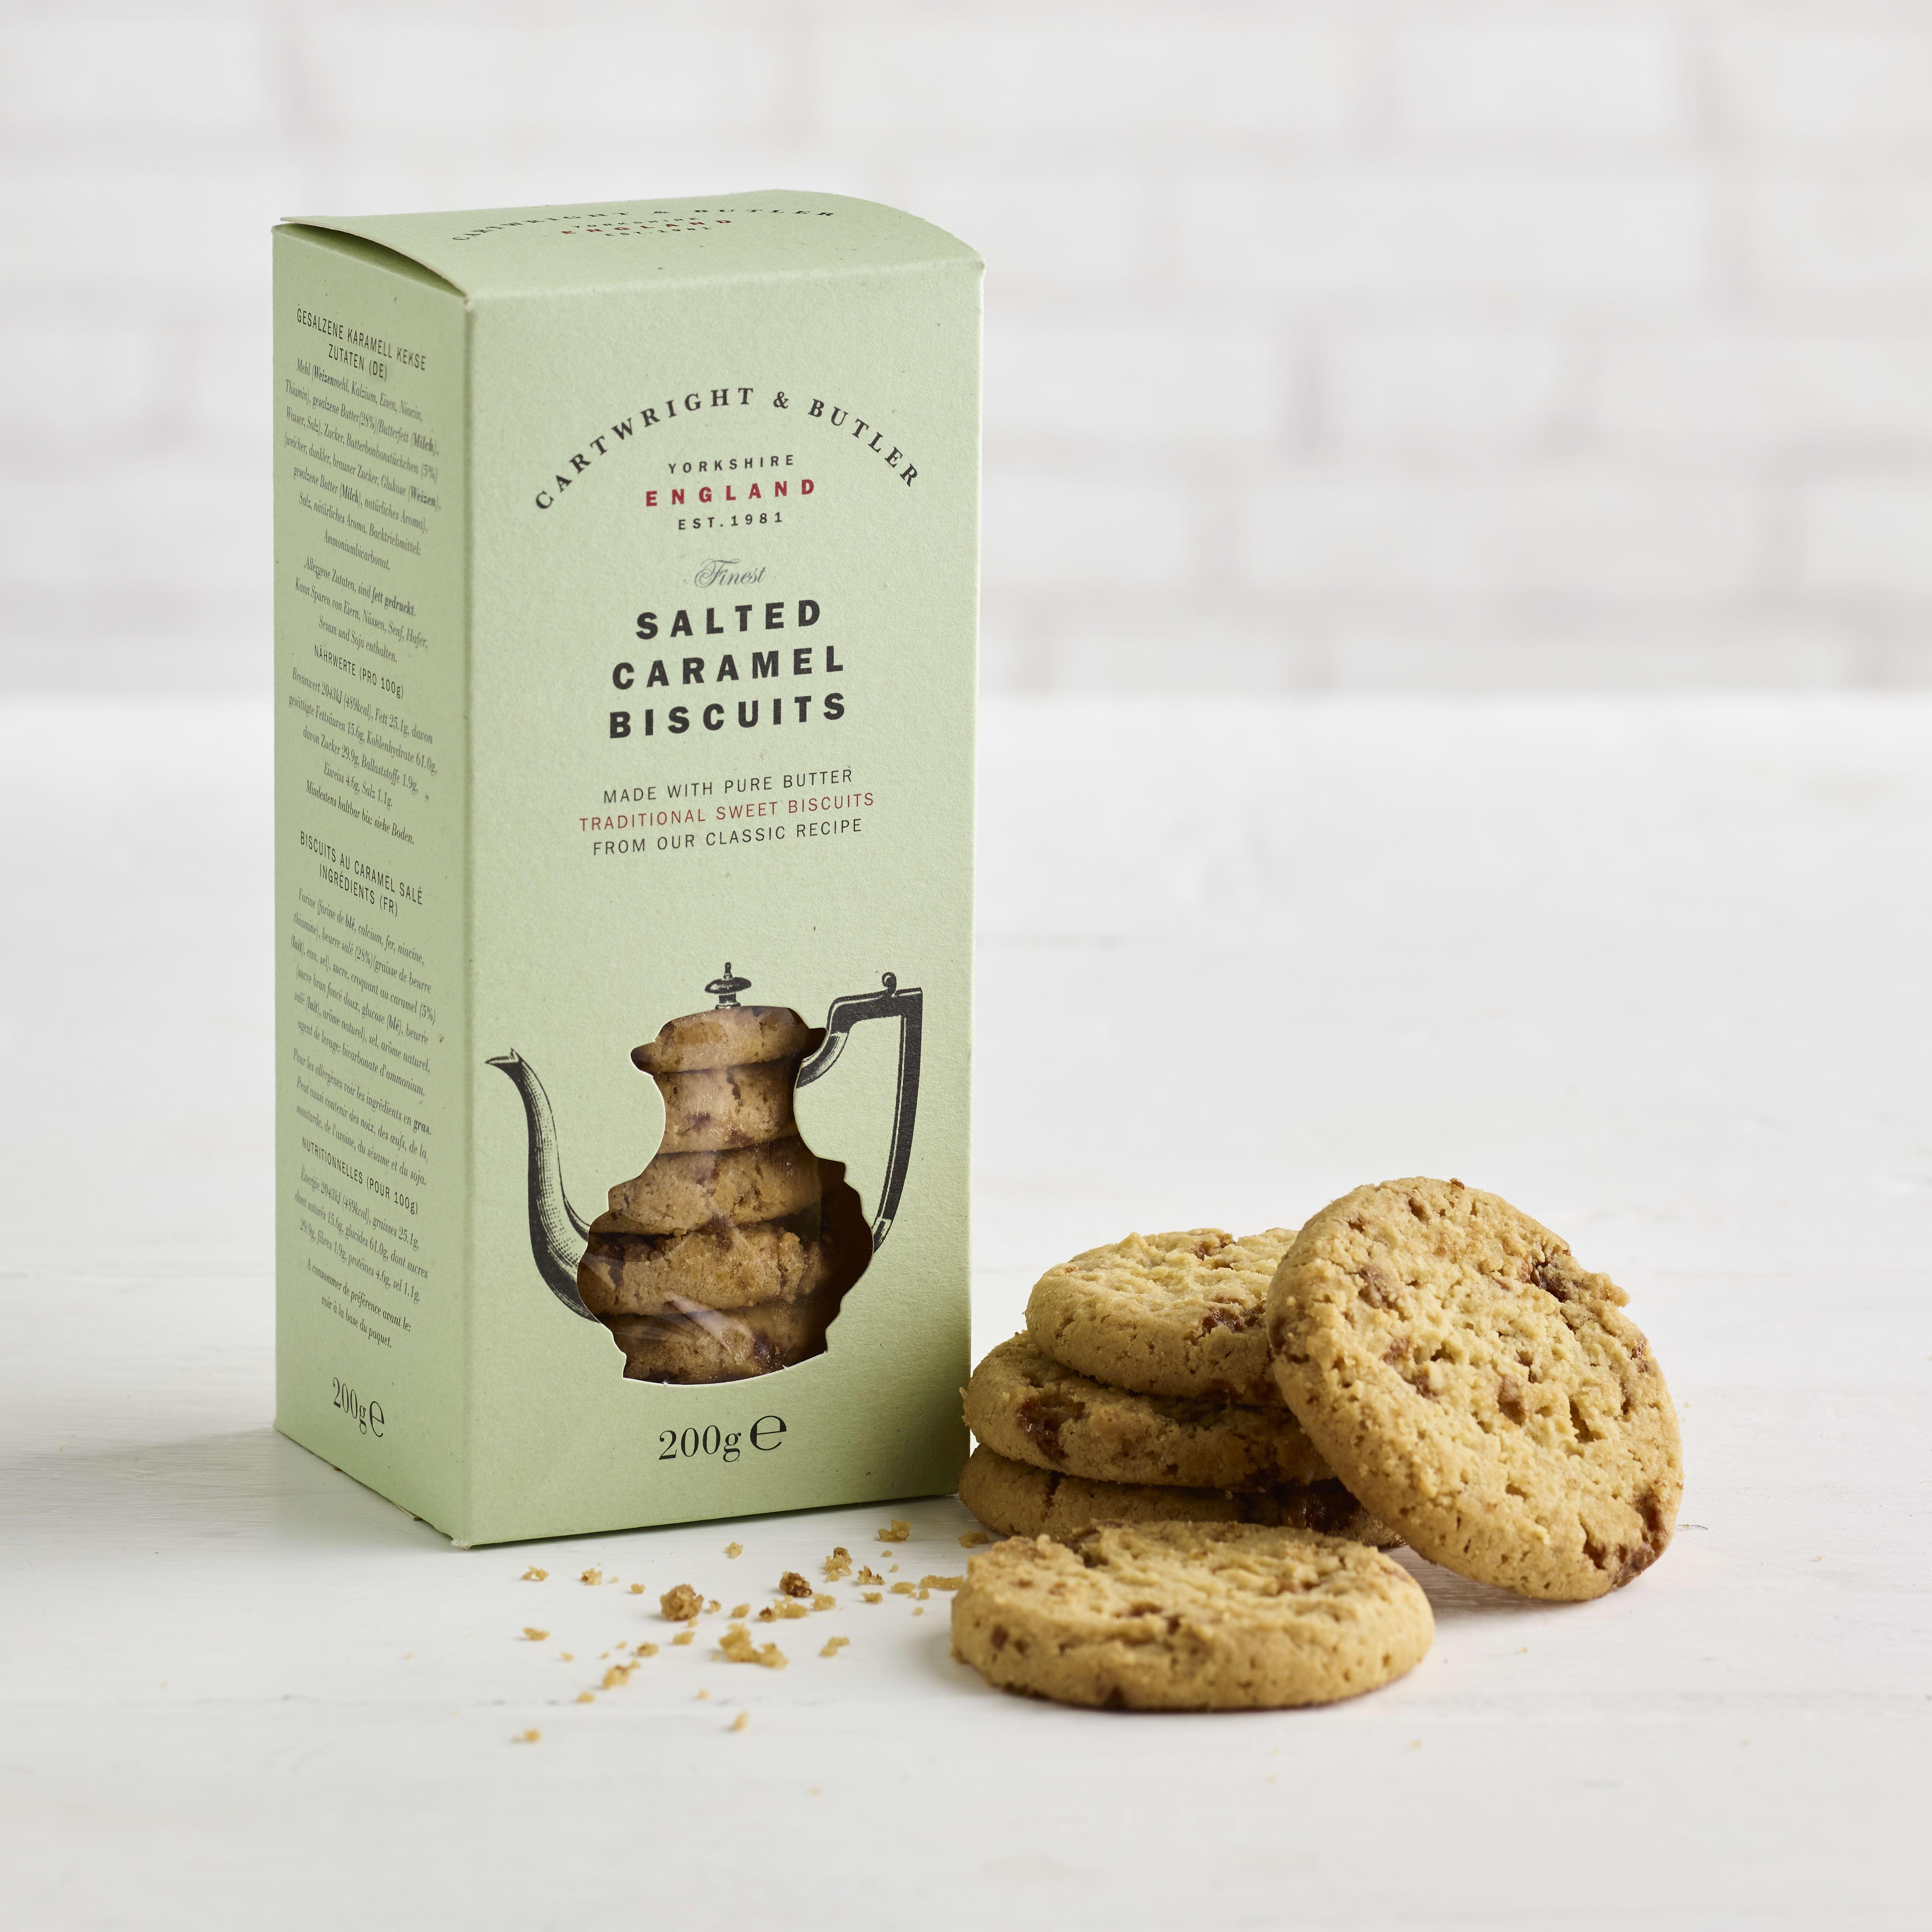 Cartwright & Butler Salted Caramel Biscuits, 200g